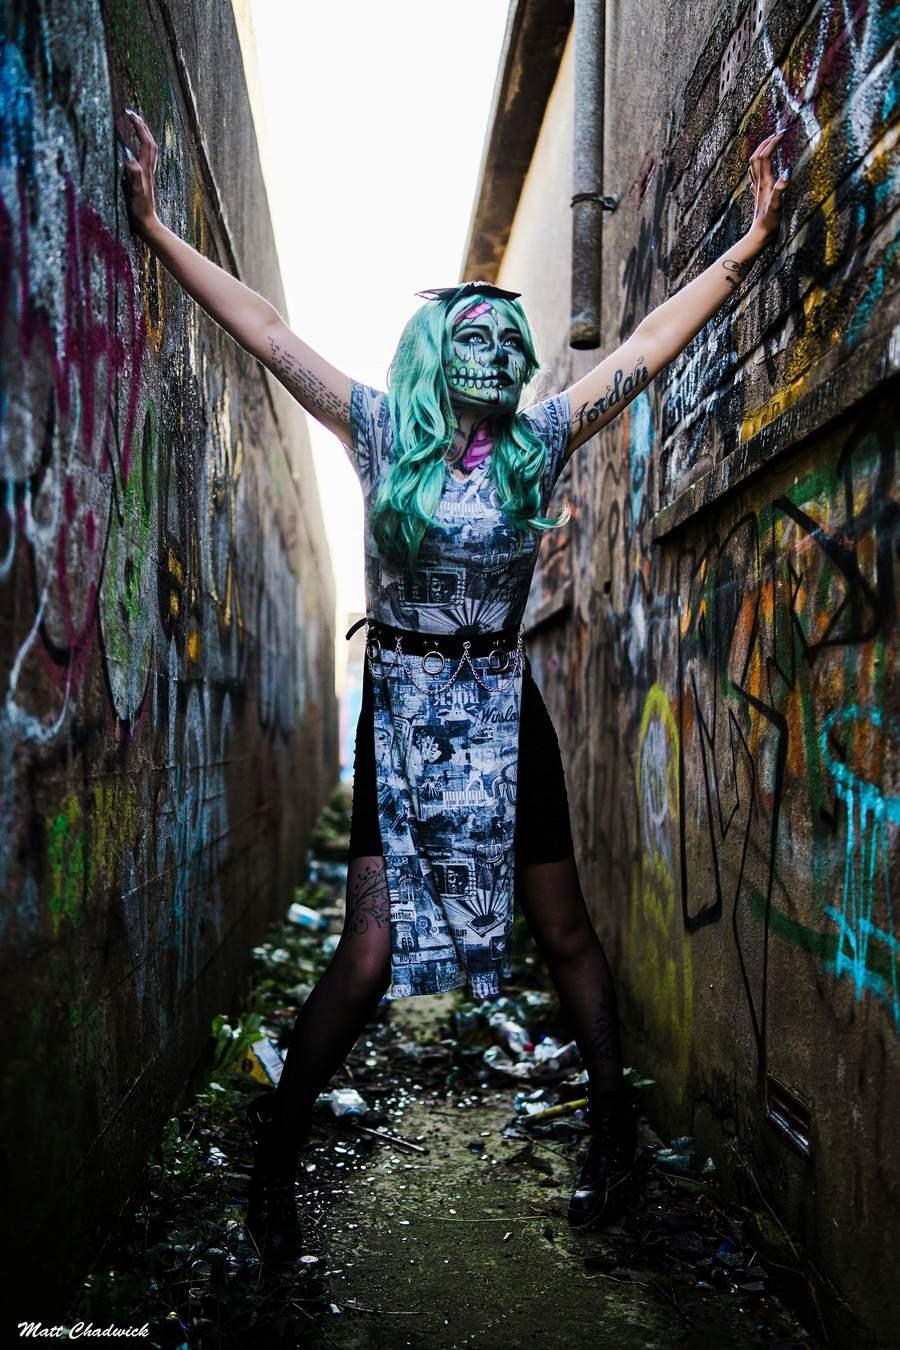 Photography by Matt Chadwick, Model Kelly Austin, Makeup by Kelly Austin Mua / Uploaded 31st October 2019 @ 08:20 AM